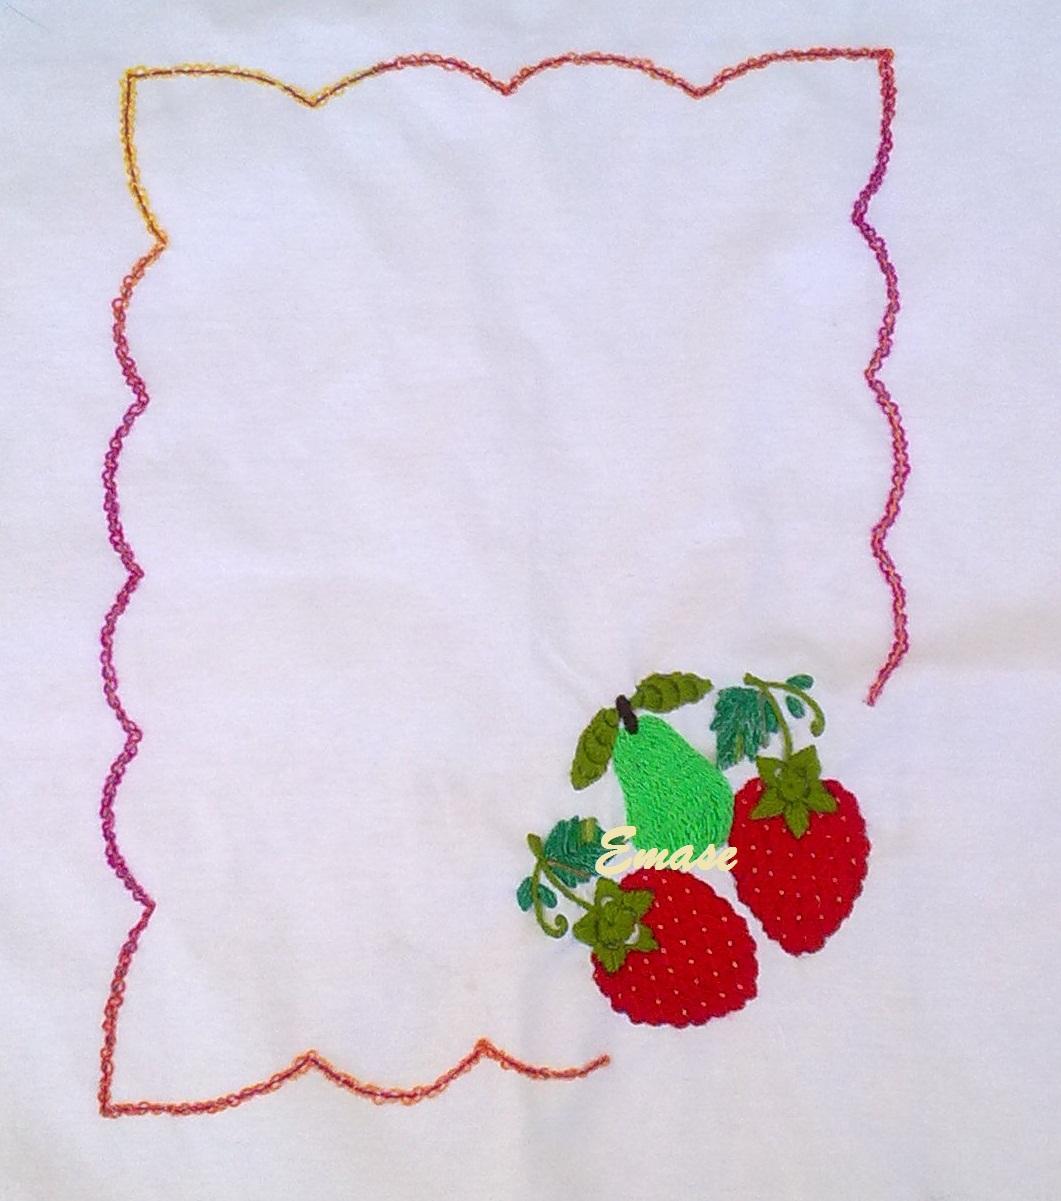 Worksheet. A crear con imaginacin Fieltro foamy tela reciclar etc